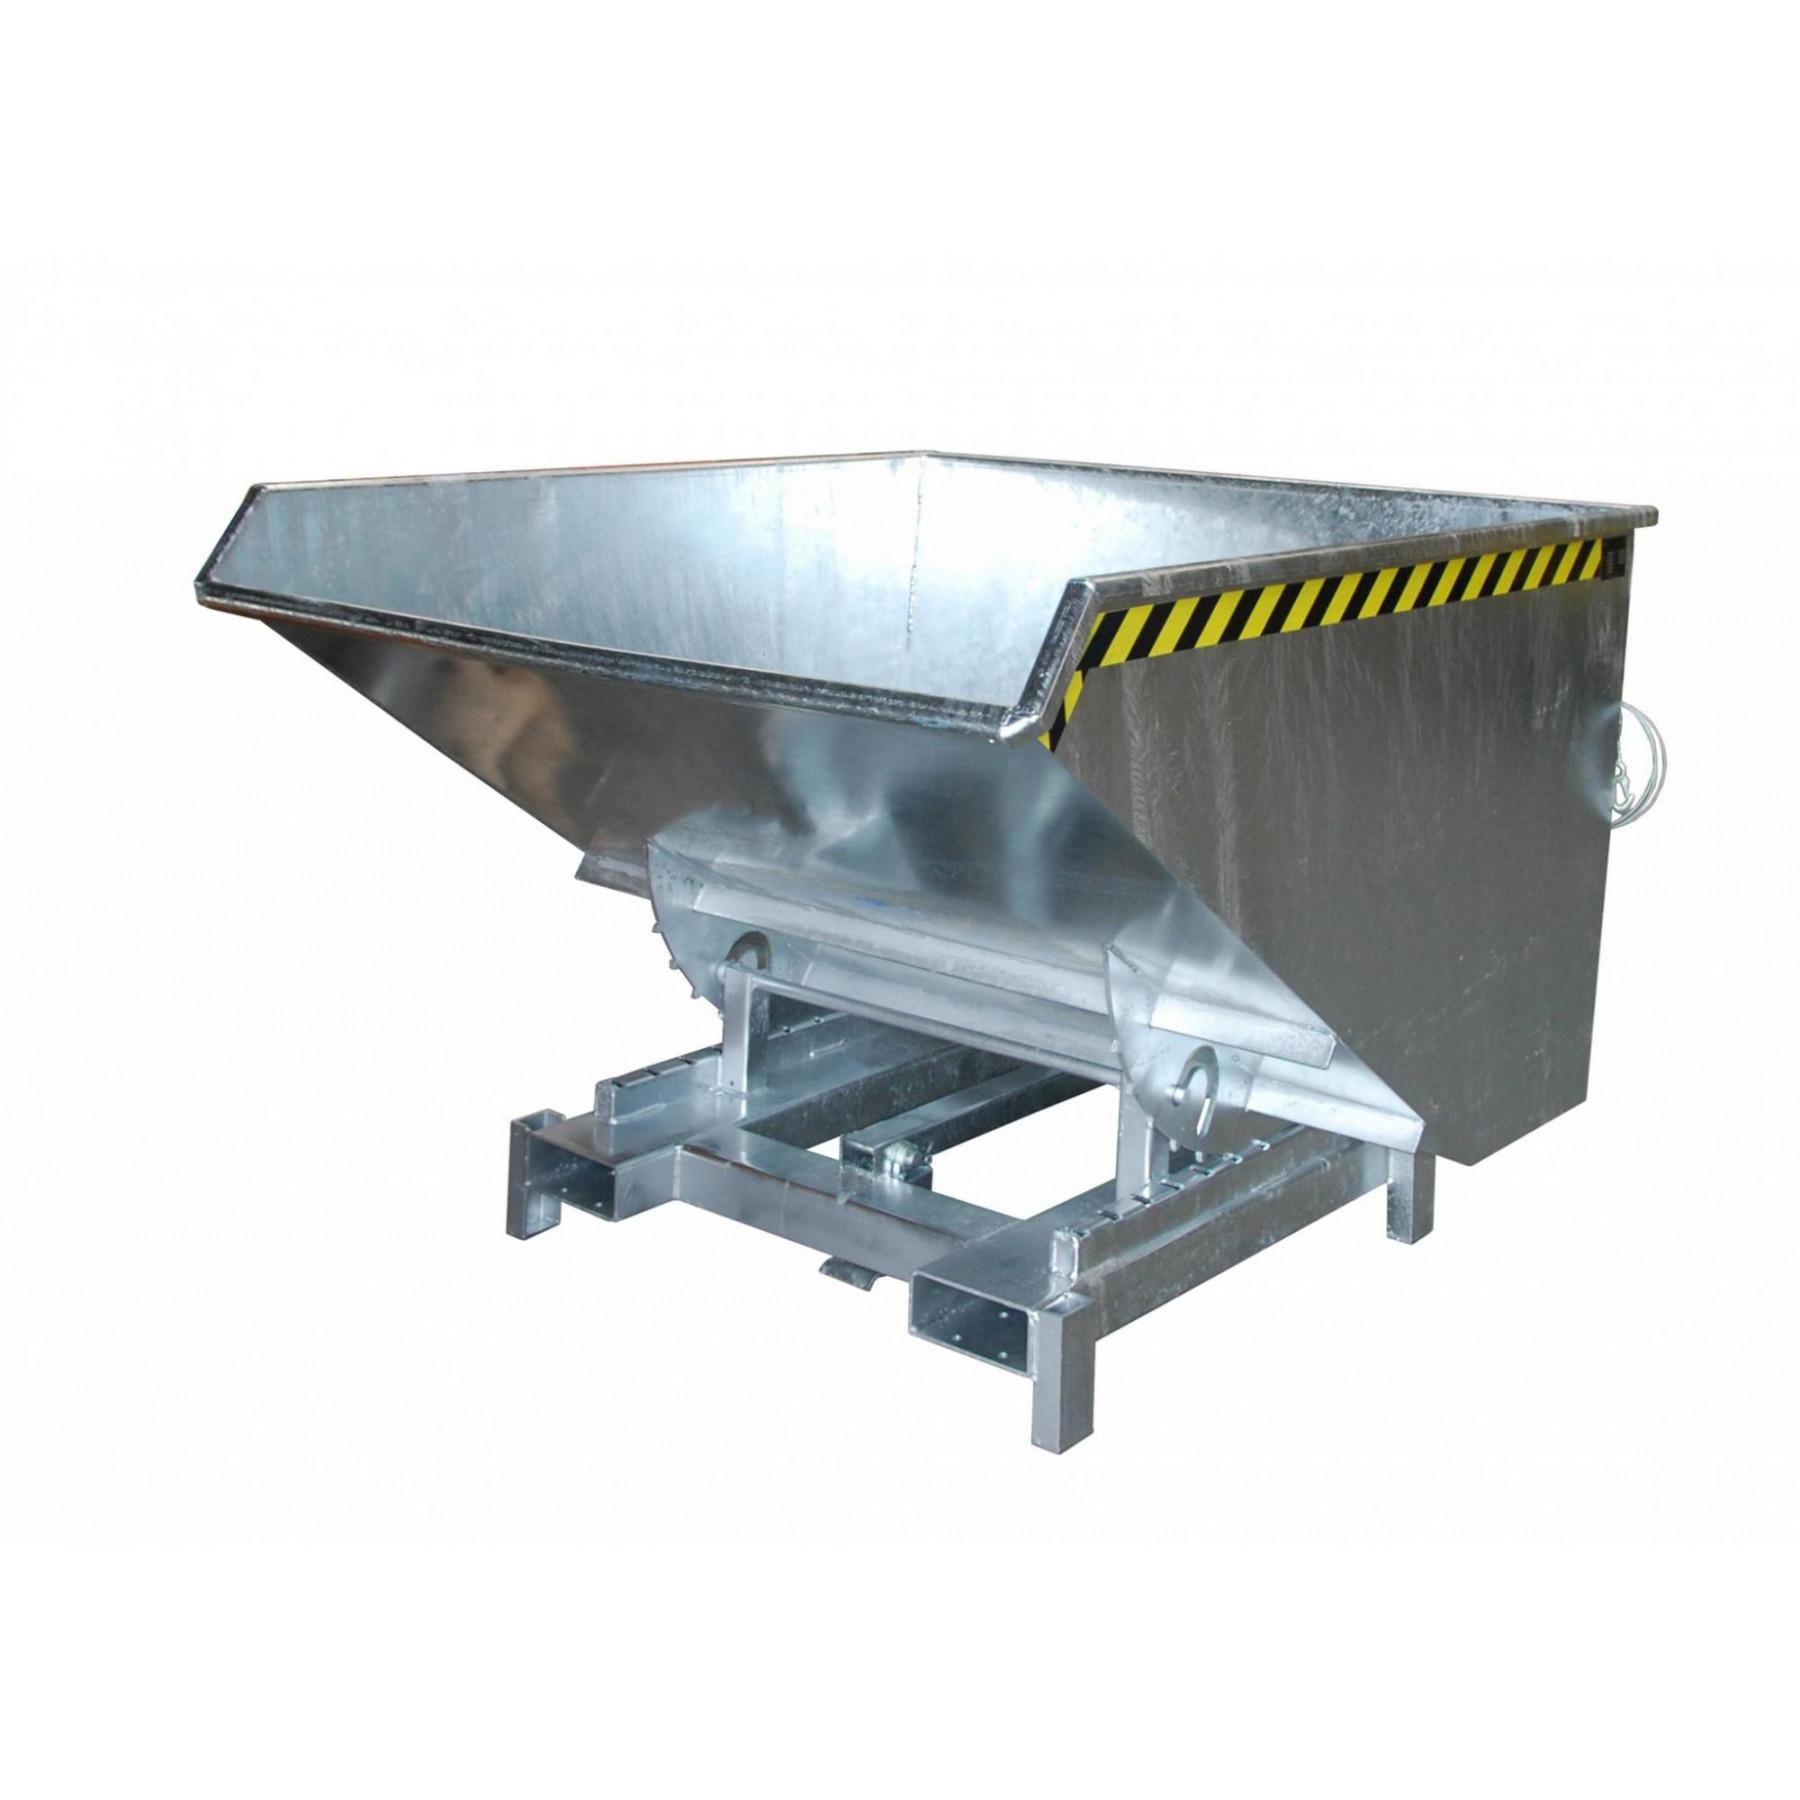 Kiepcontainer extra zwaar 1200 liter, MTF-SK-1200-V